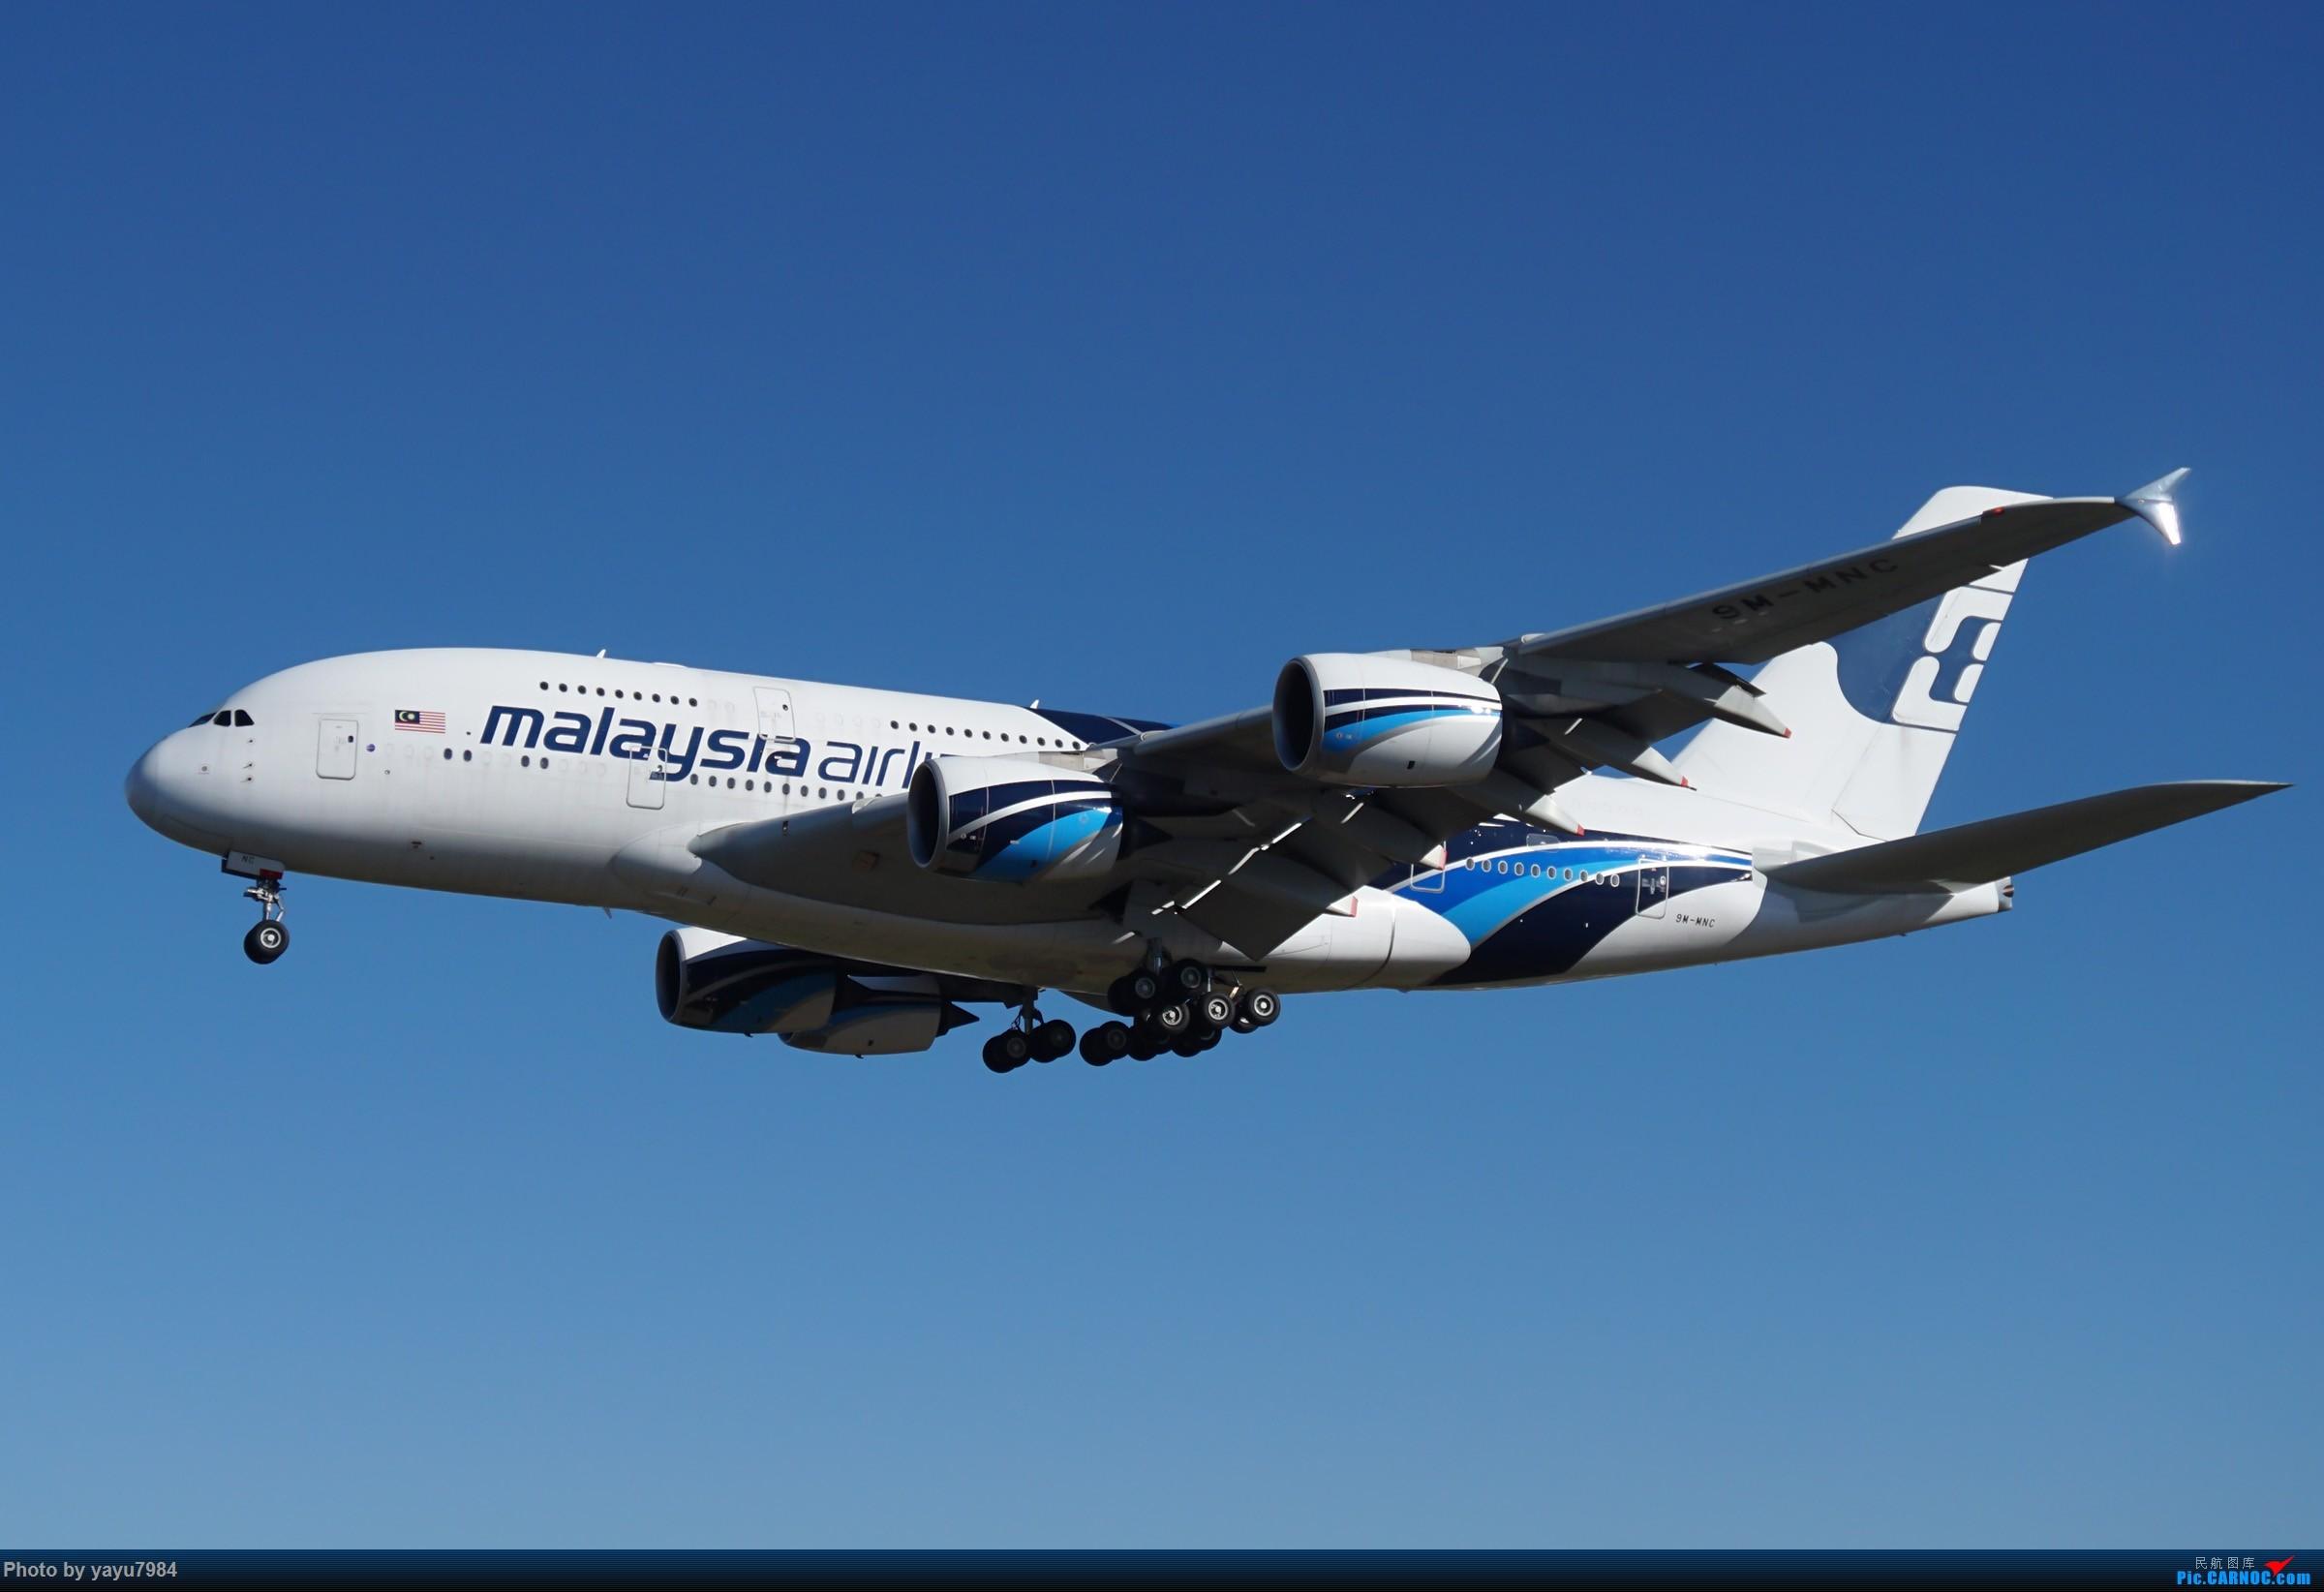 Re:[原创][SYD] 晨悉尼,16R扎堆到达 AIRBUS A380-800 9M-MNC 澳大利亚悉尼金斯福德·史密斯机场